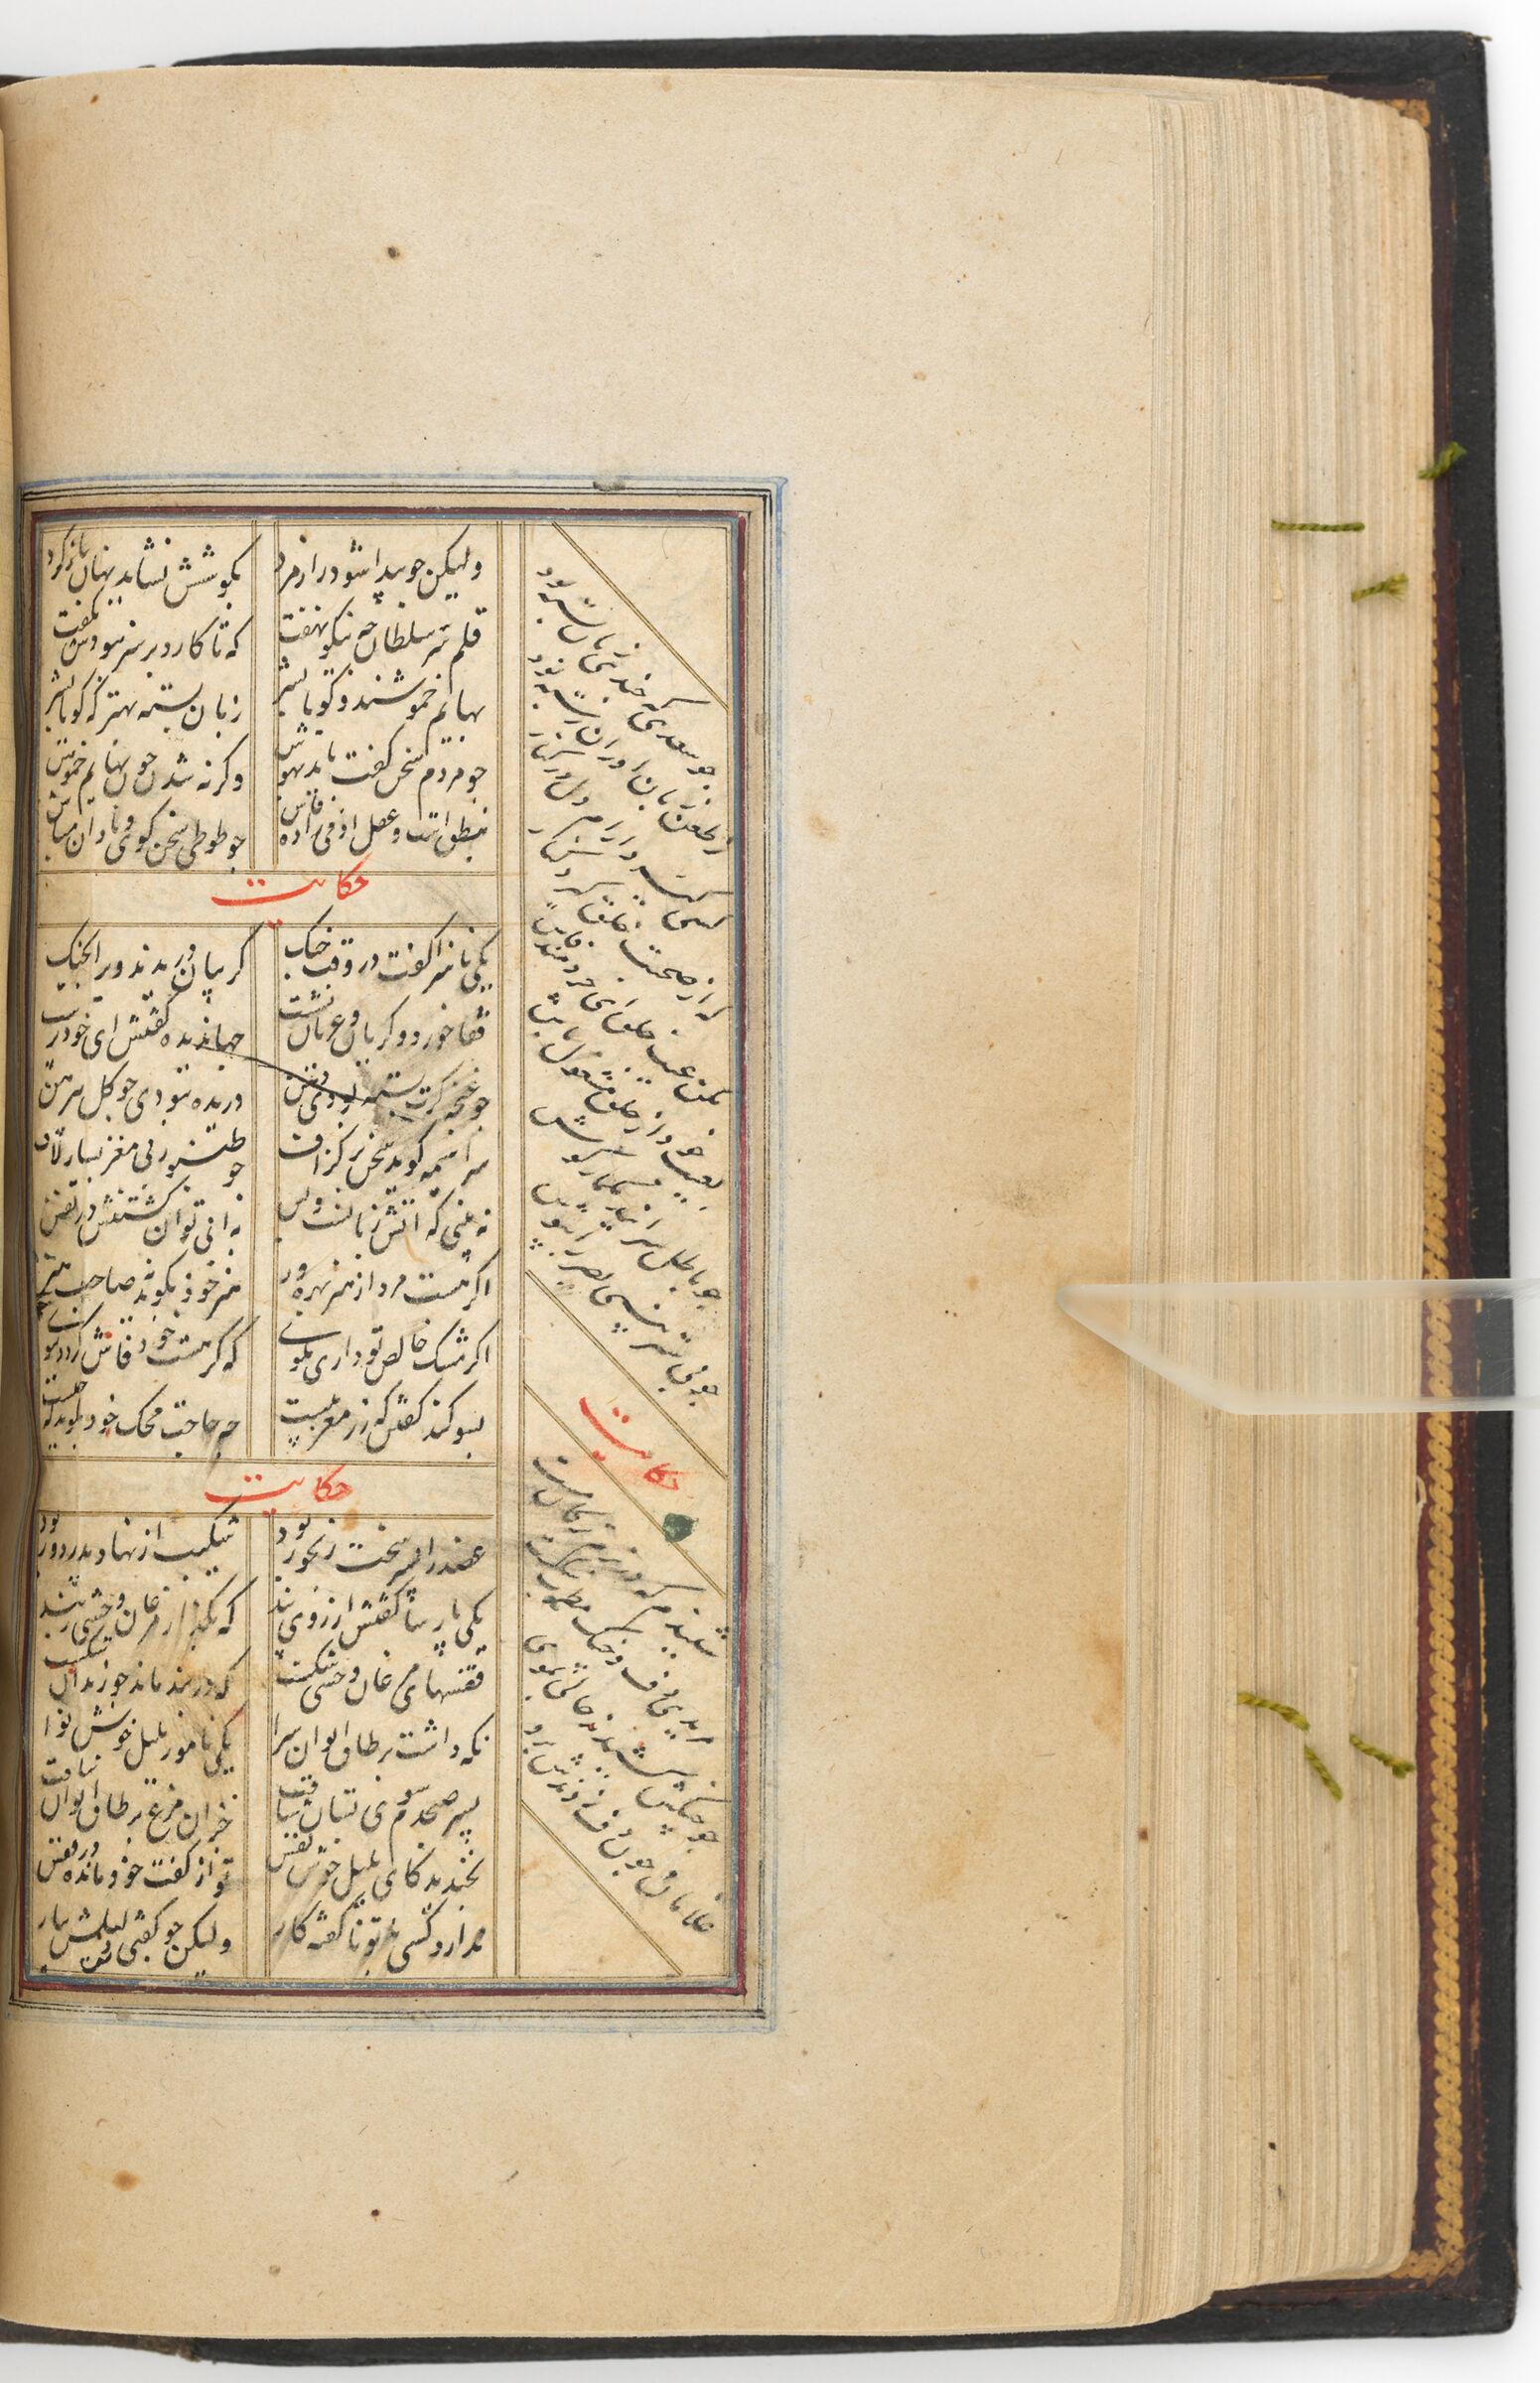 Text Folio (Text Recto; Text Verso Of Folio 132), From A Manuscript Of The Kulliyat Of Sa'di